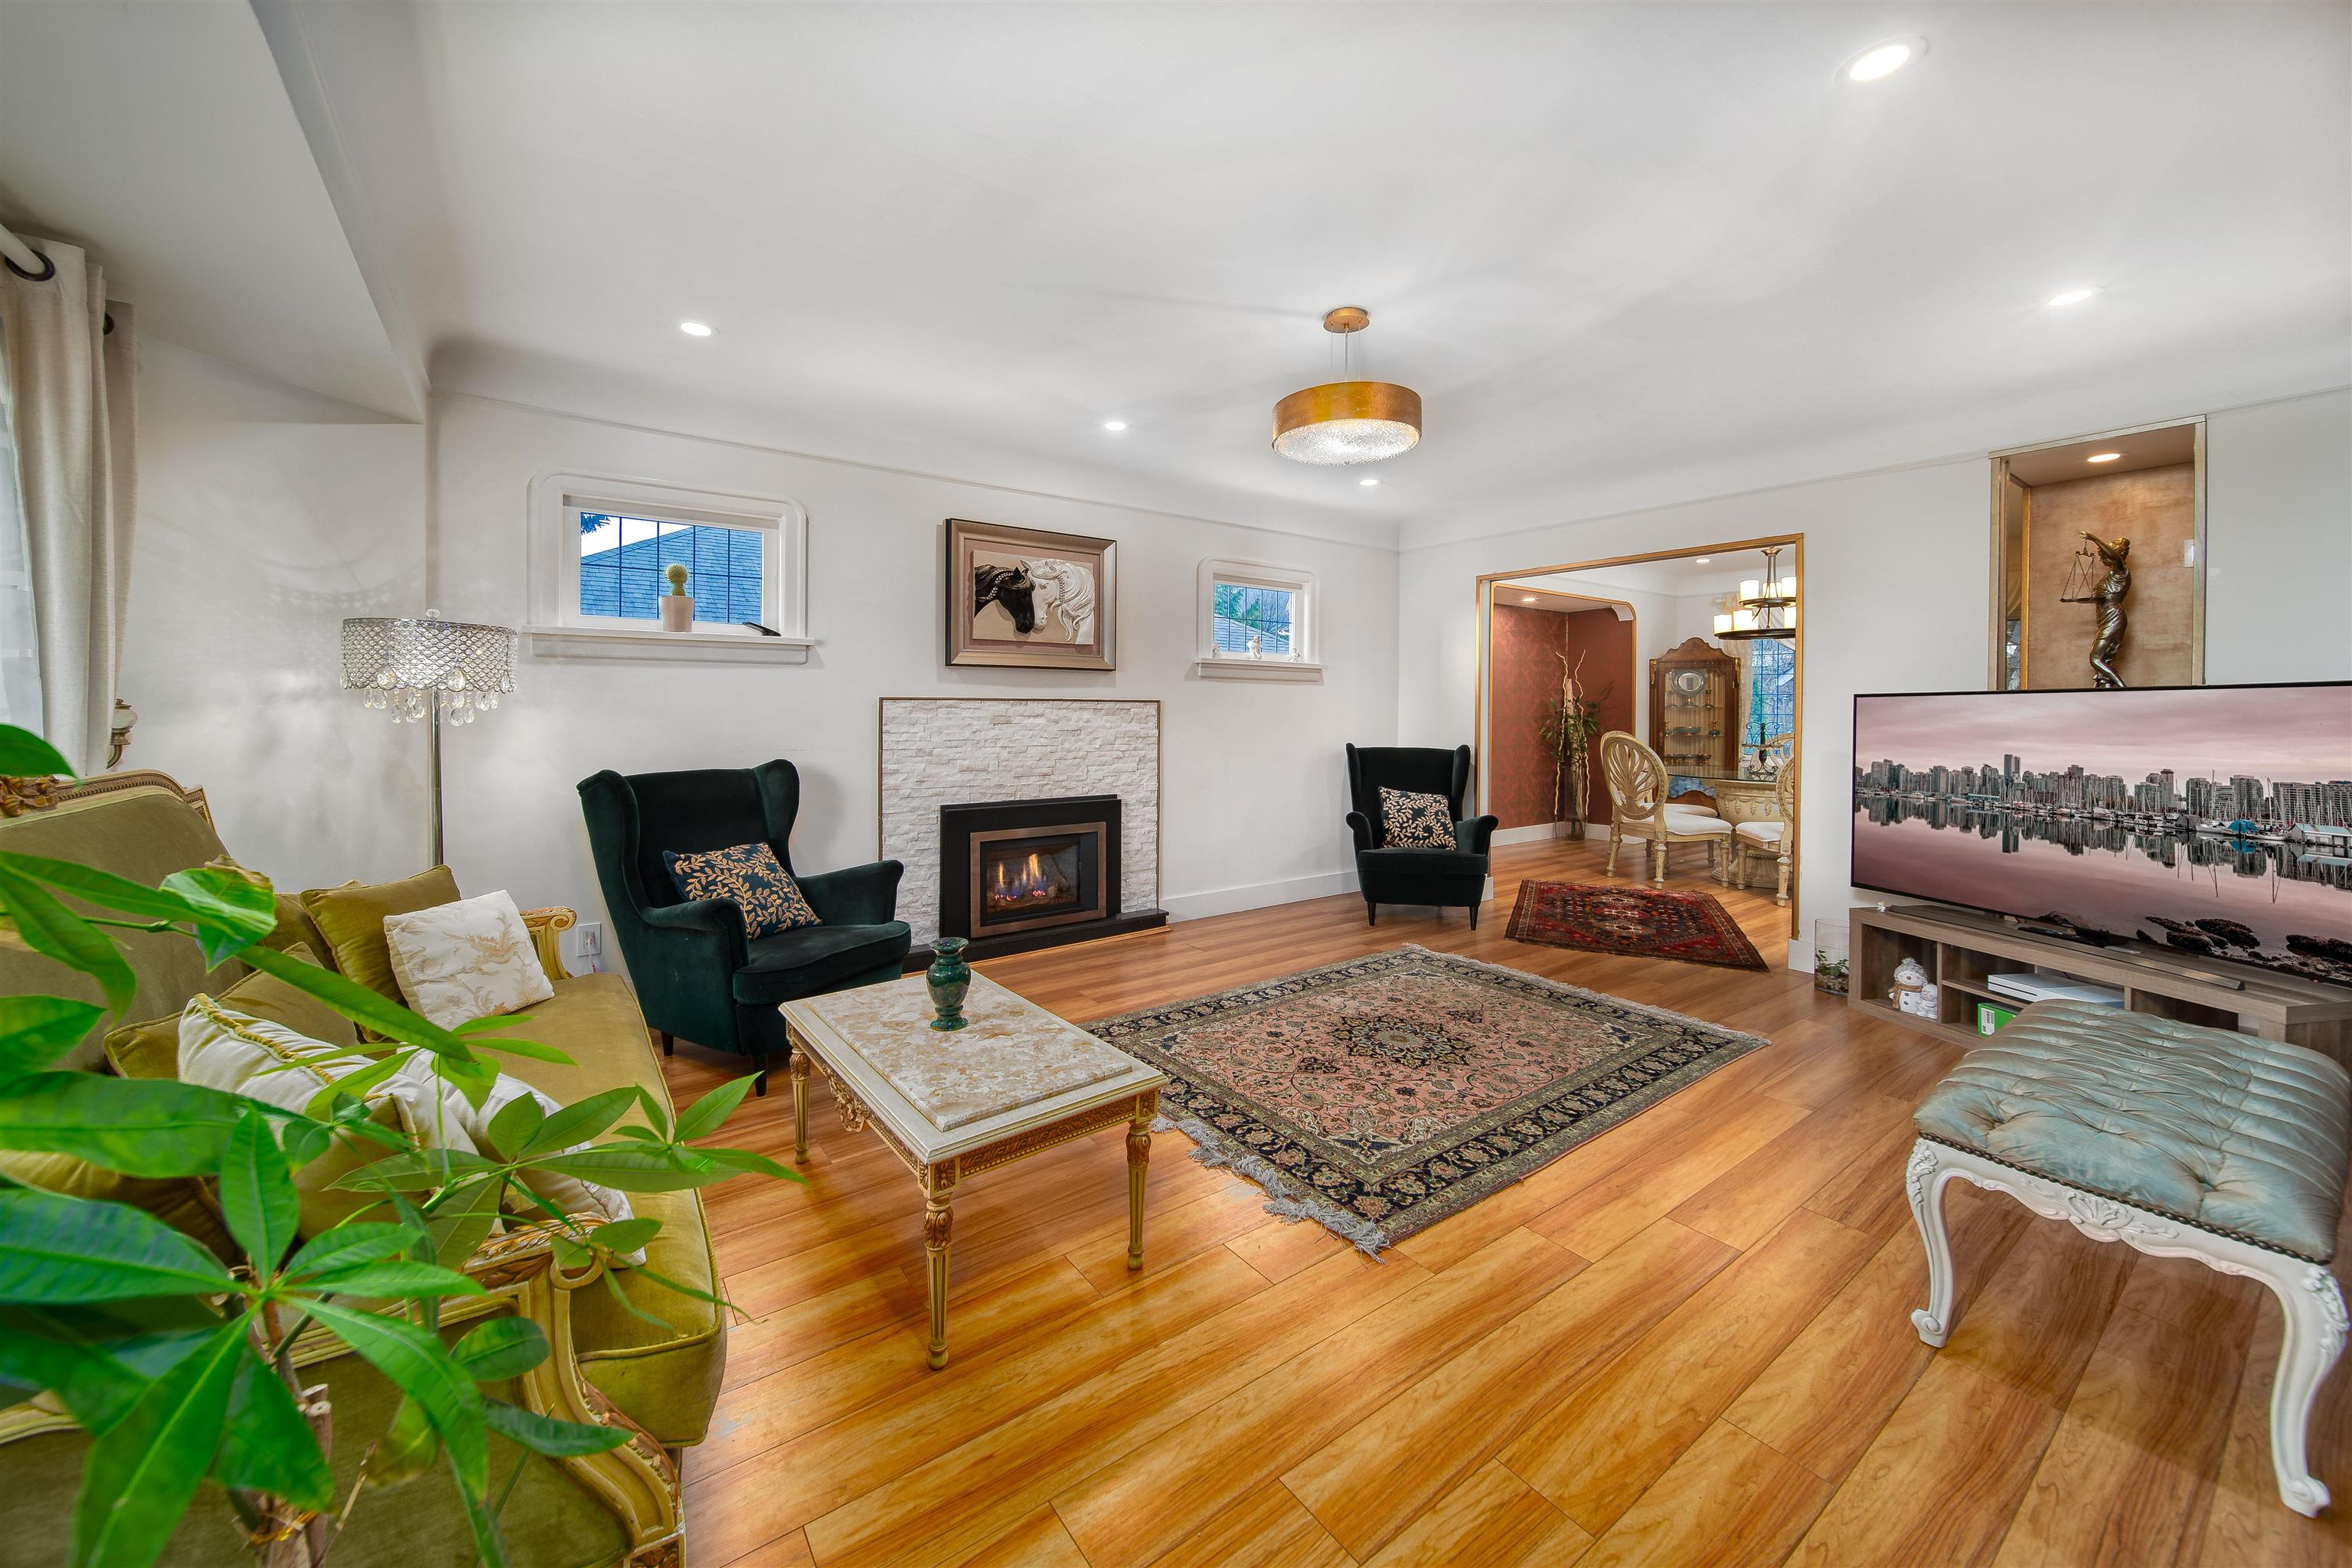 1357 FULTON AVENUE - Ambleside House/Single Family for sale, 6 Bedrooms (R2617731) - #8